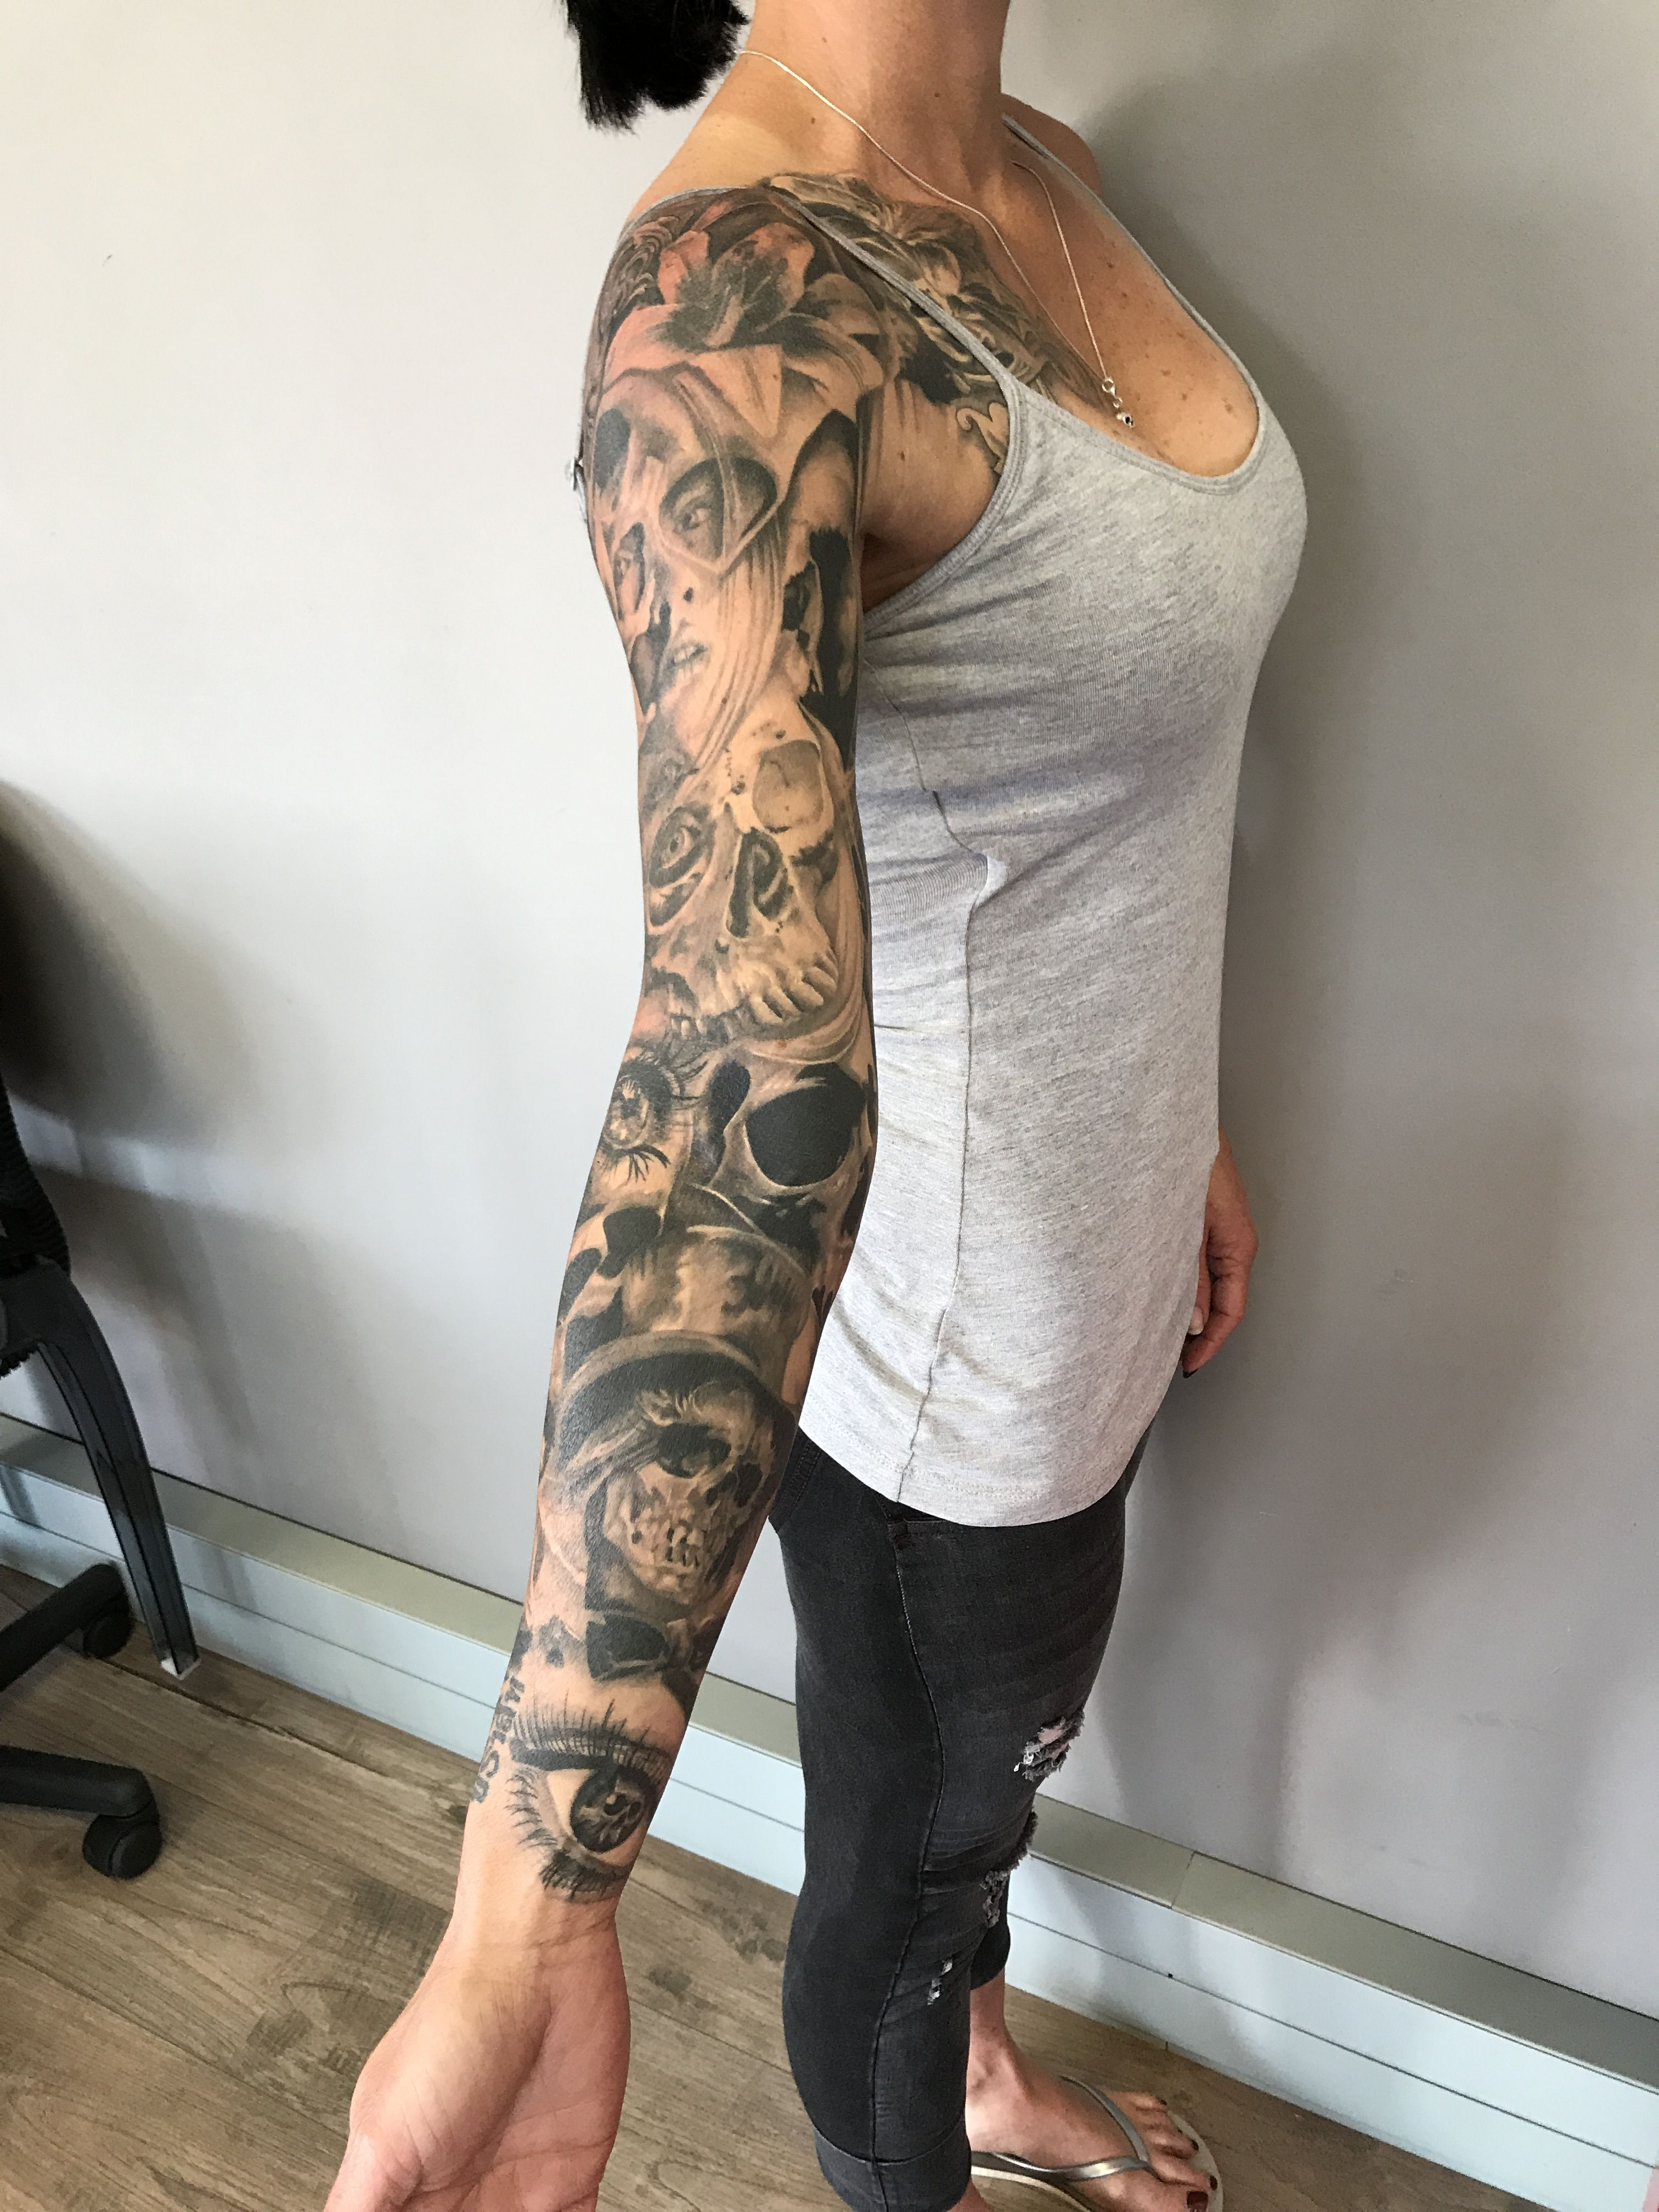 Pin by Bernadee Biddle Theunis Coetze on Awhe Tattoo